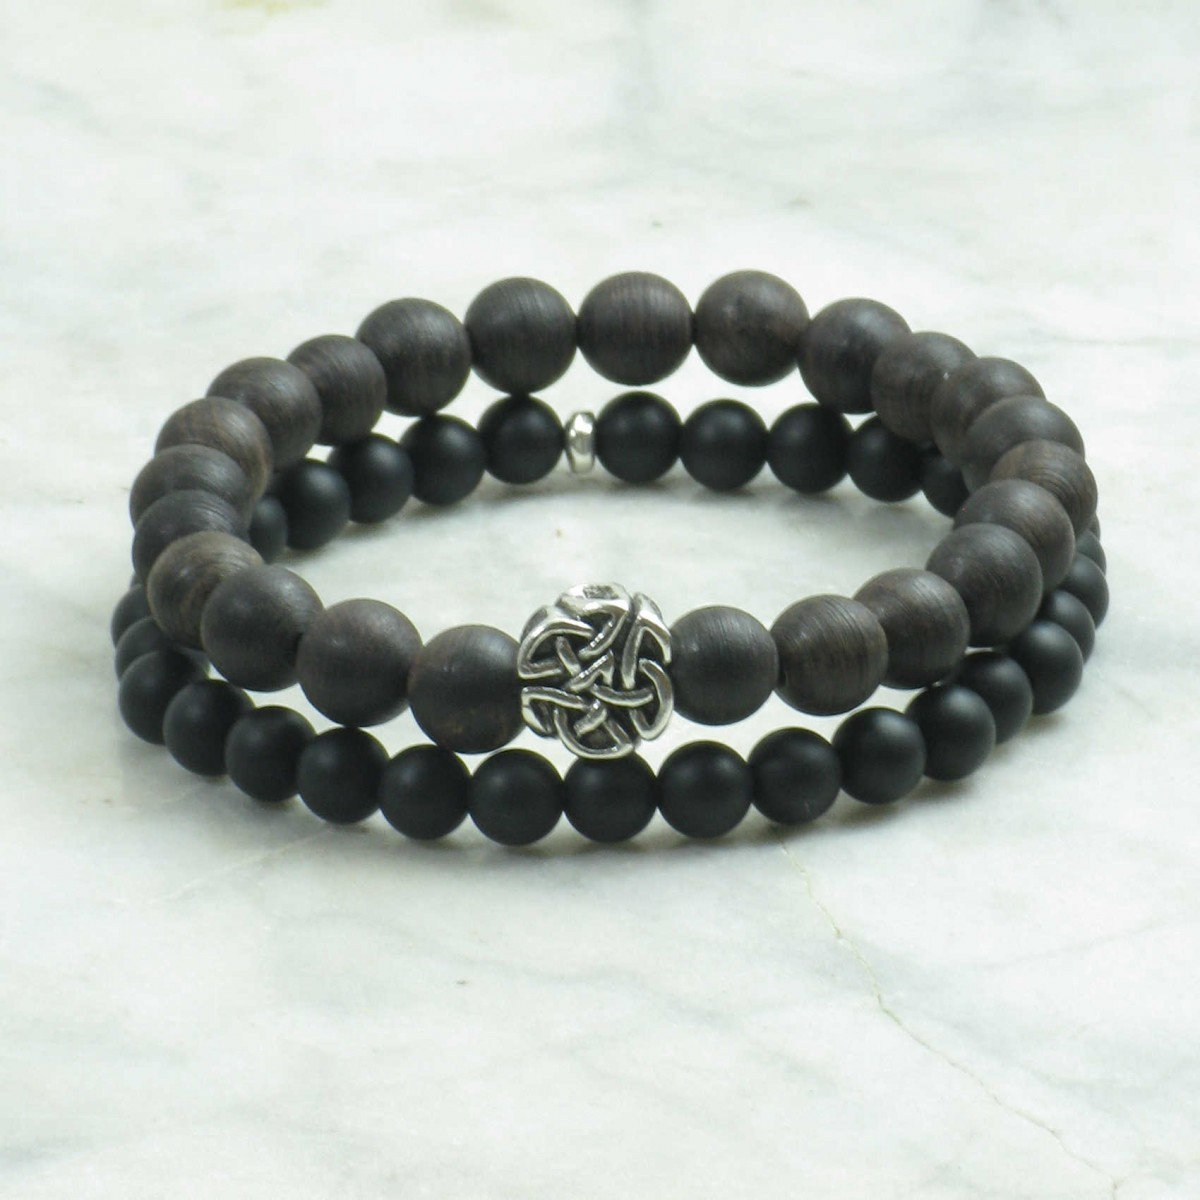 Sakya_Bracelets_for_Men_Mala_Beads_Stacks_Agarwood_Black_Agate_Buddhist_Prayer_Beads